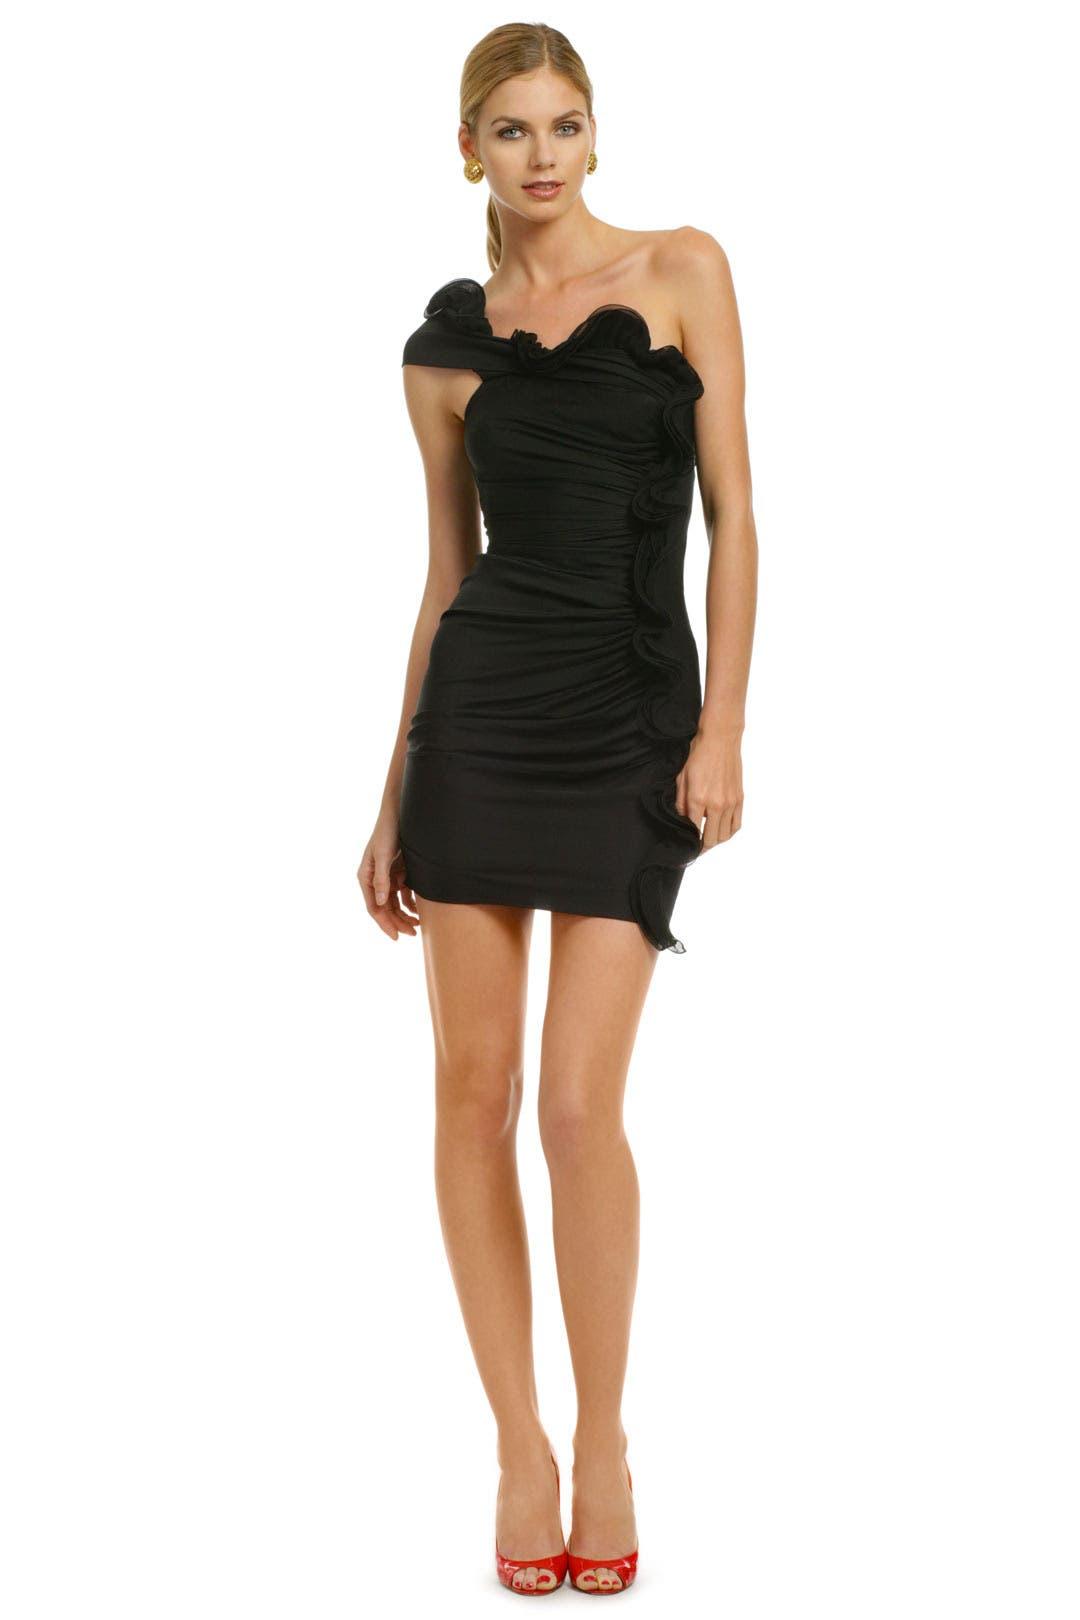 Smoking Shoulder Dress by Catherine Malandrino